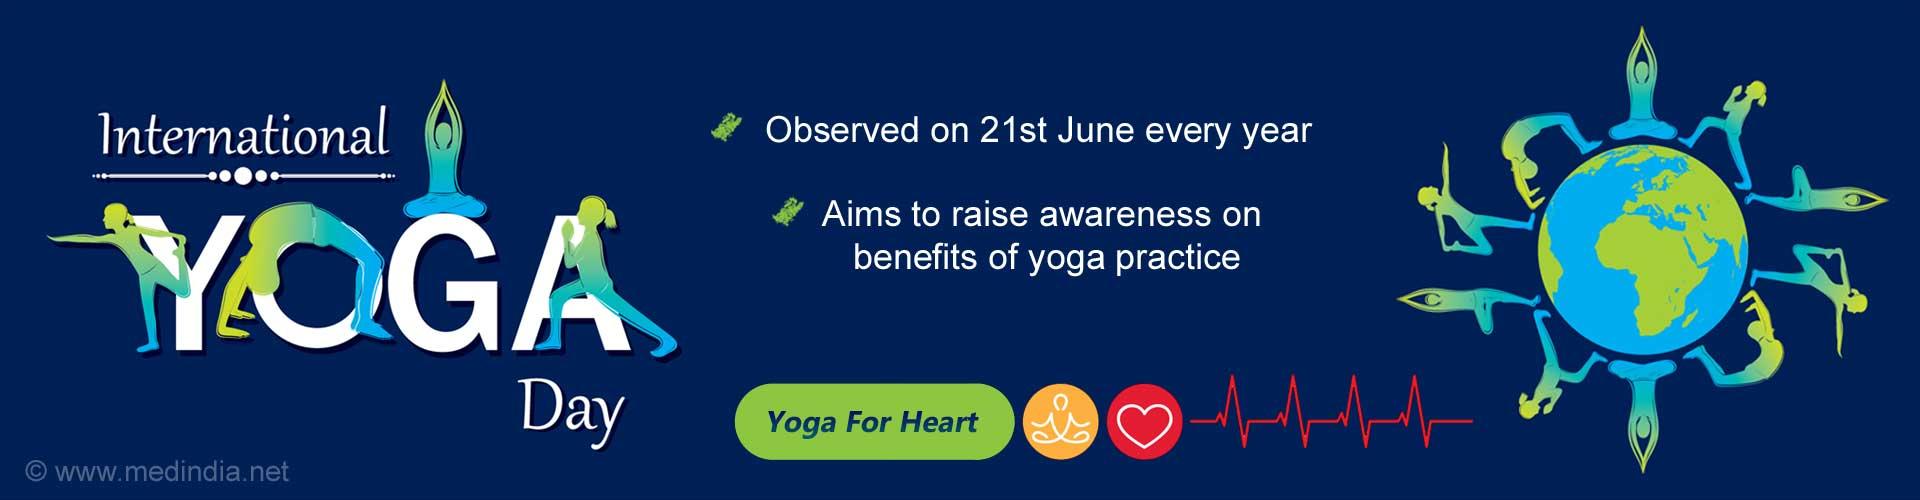 Yoga For Heart: International Day of Yoga